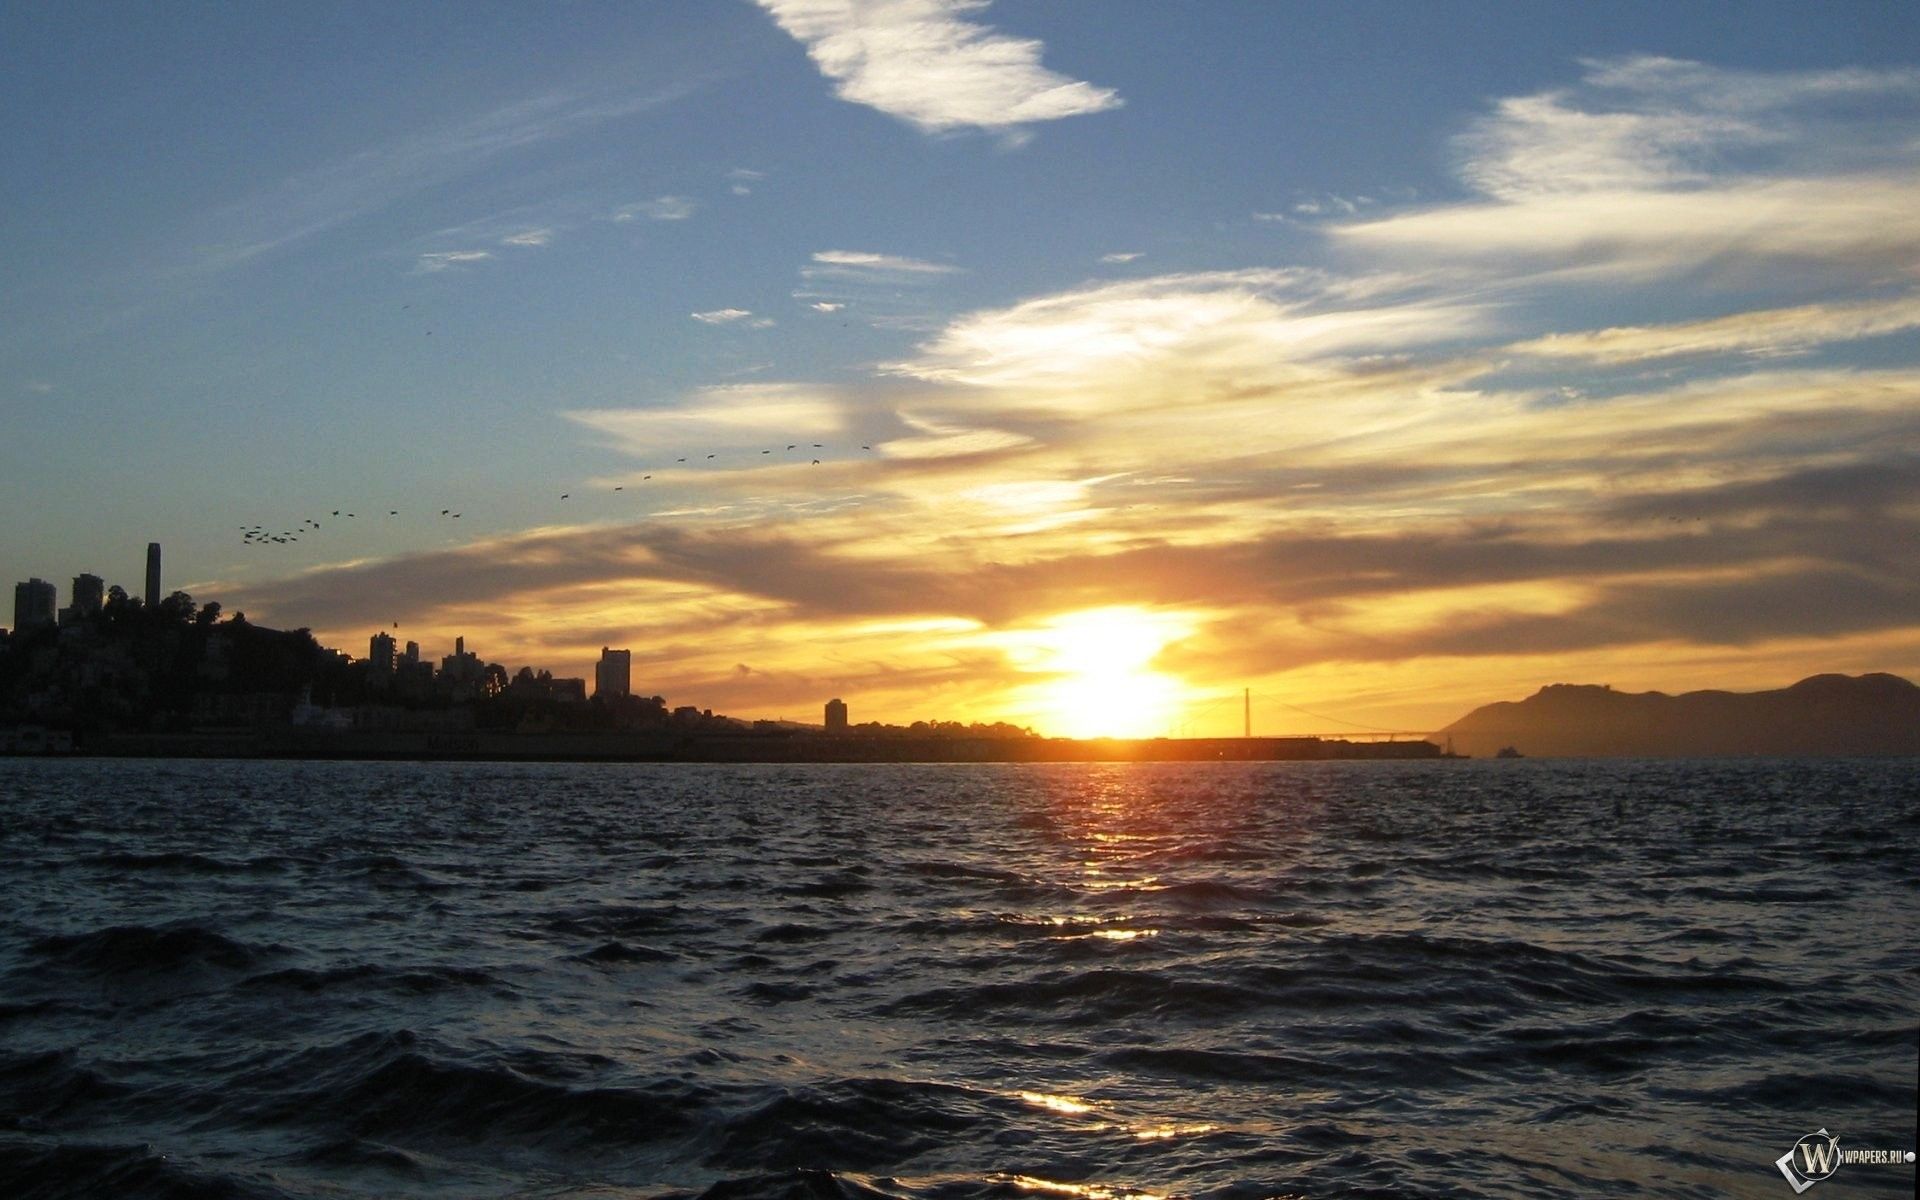 Закат над морским берегом 1920x1200